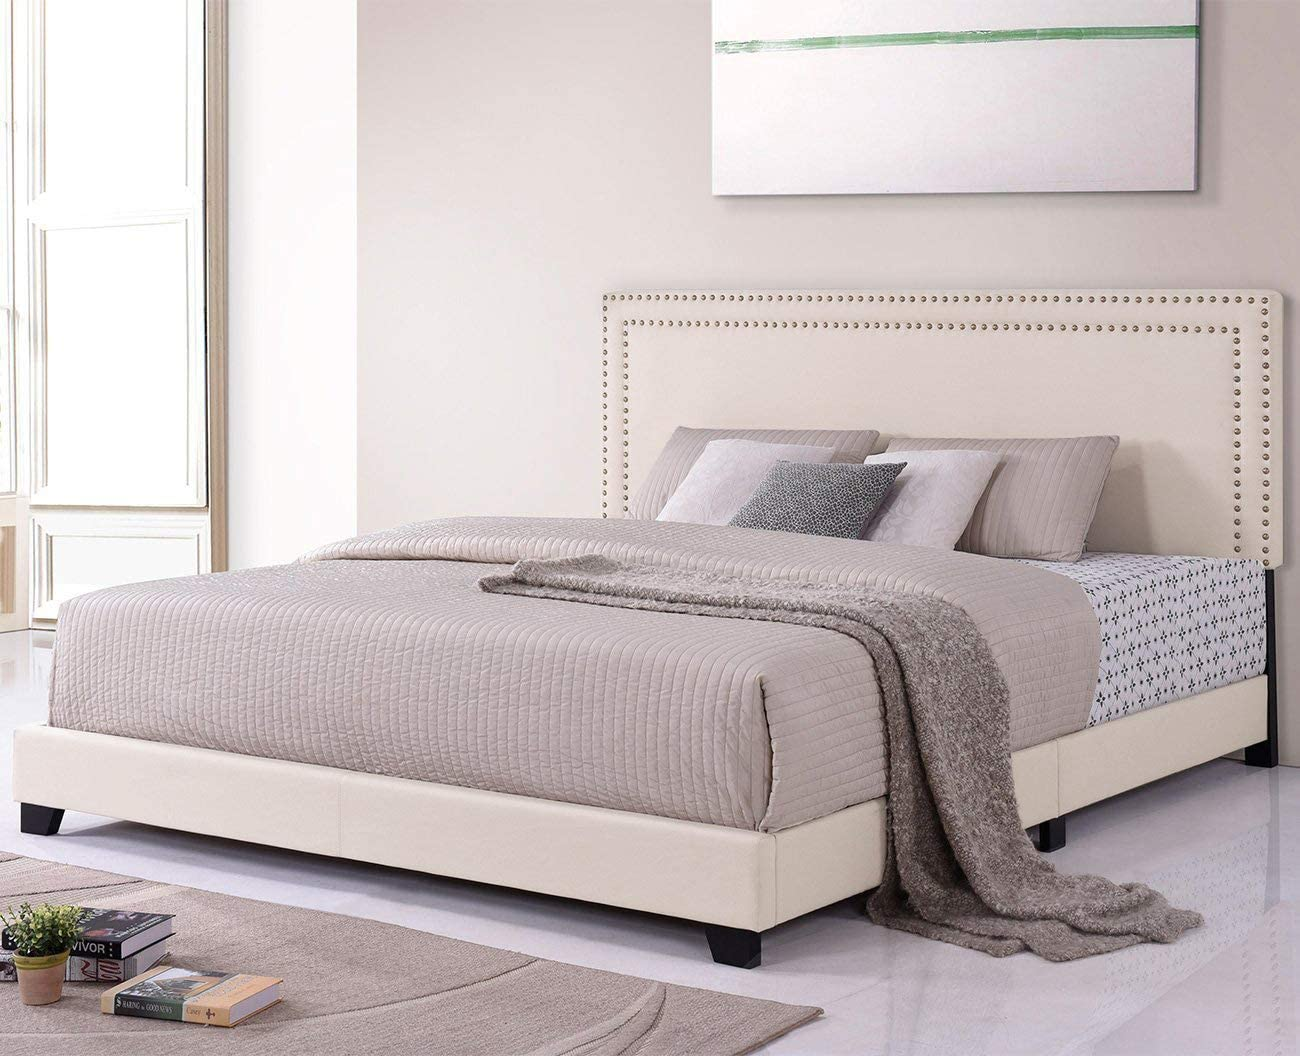 LZ LEISURE ZONE King Bed Frame Upholstered Platform Mattress Foundation with Wooden Slat Support Nailhead Headboard Beige, King